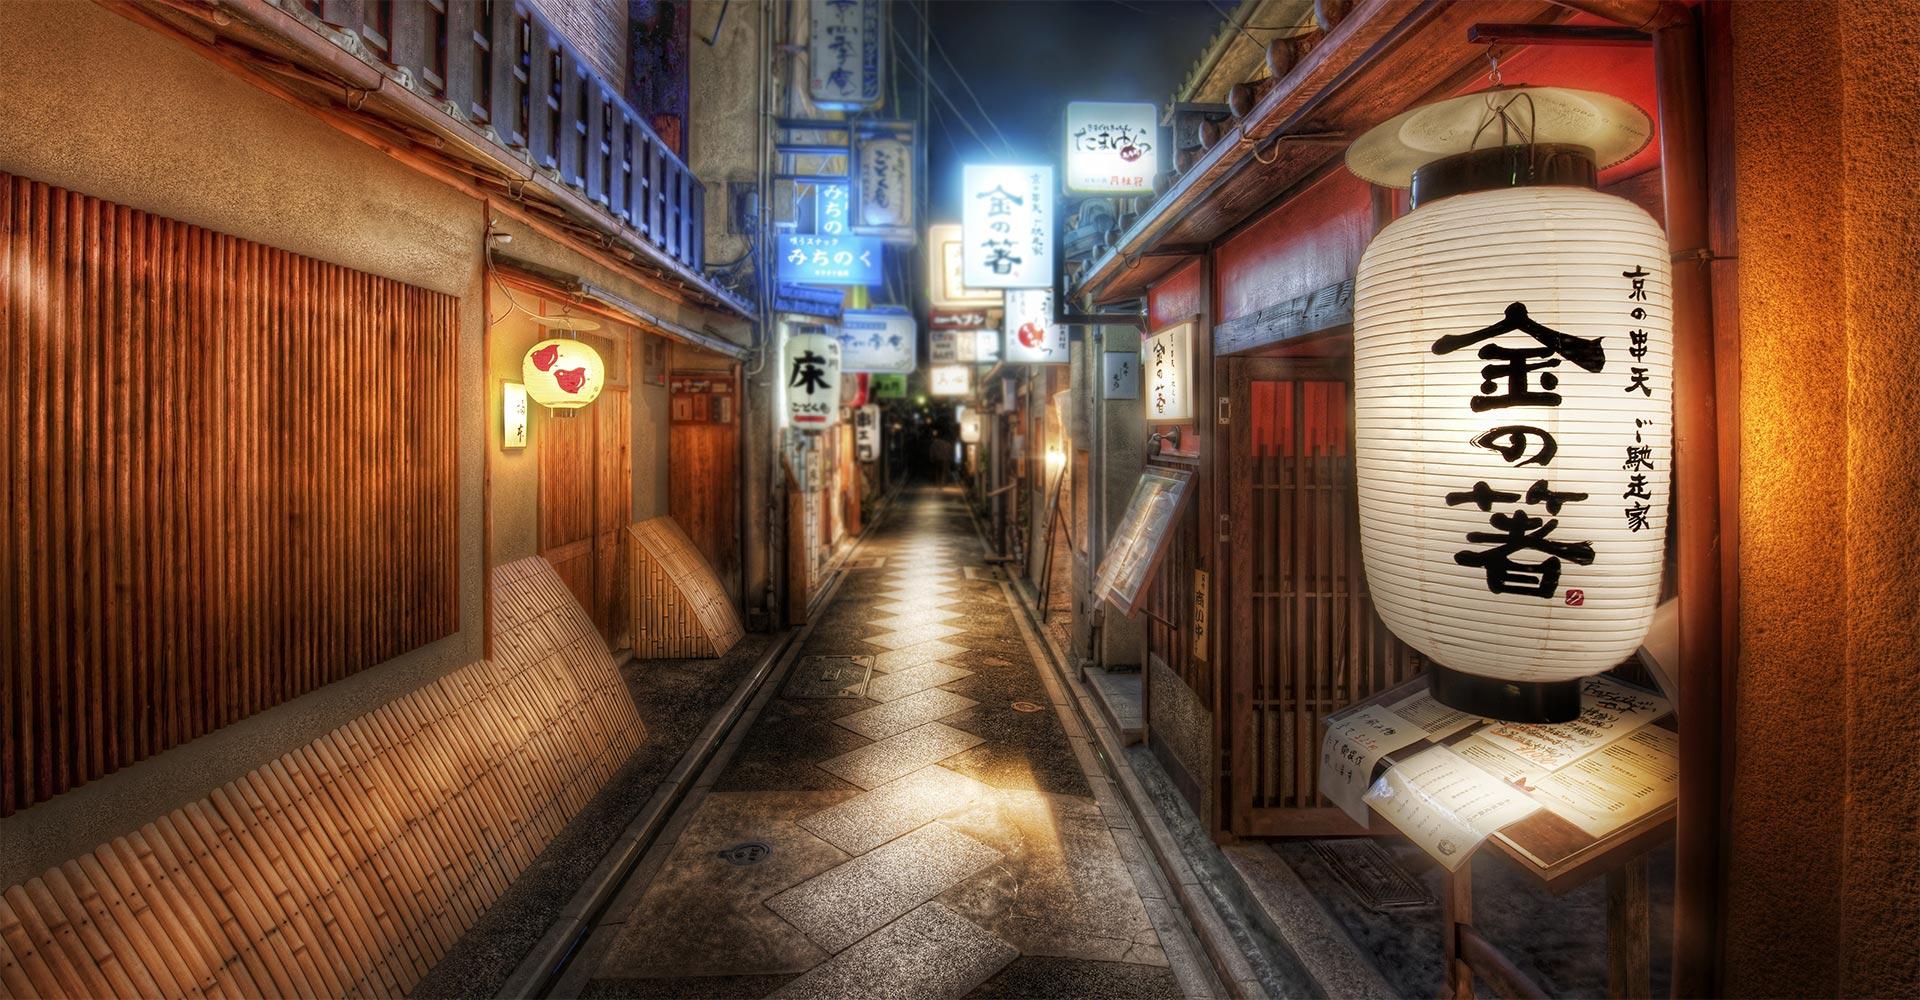 mode-sushi-take-away-consegna-ristorante-giapponese-padova-slide0